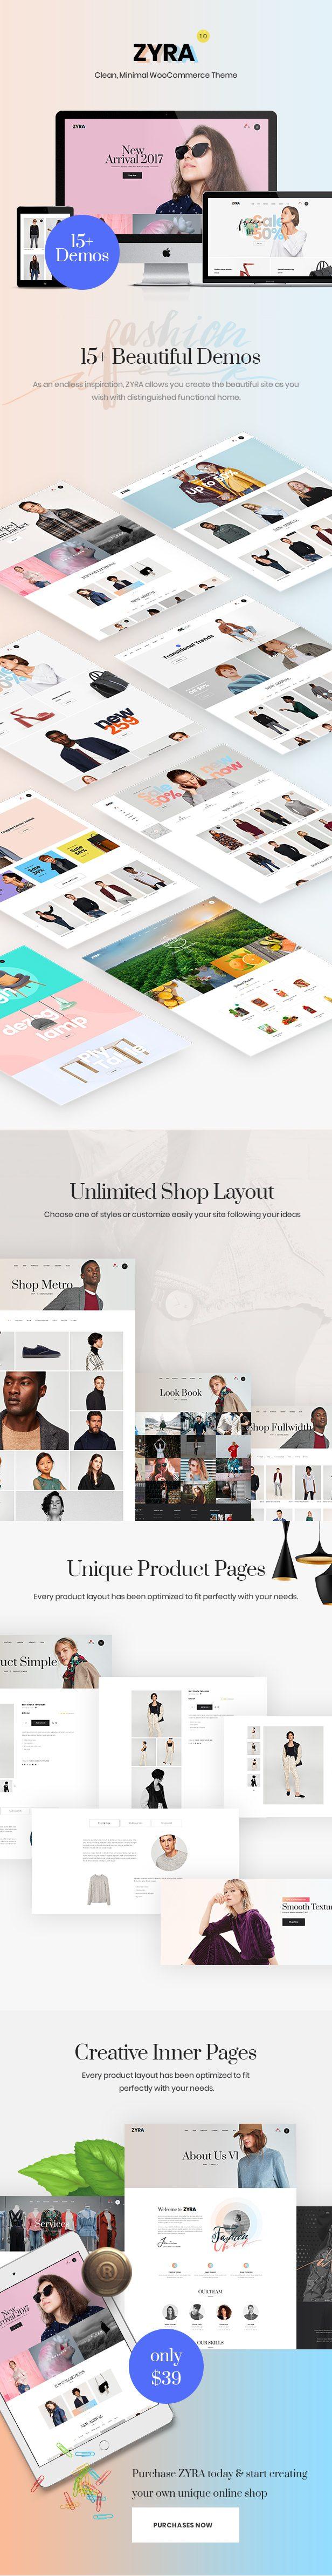 Zyra – Clean, Minimal WooCommerce Theme - 1